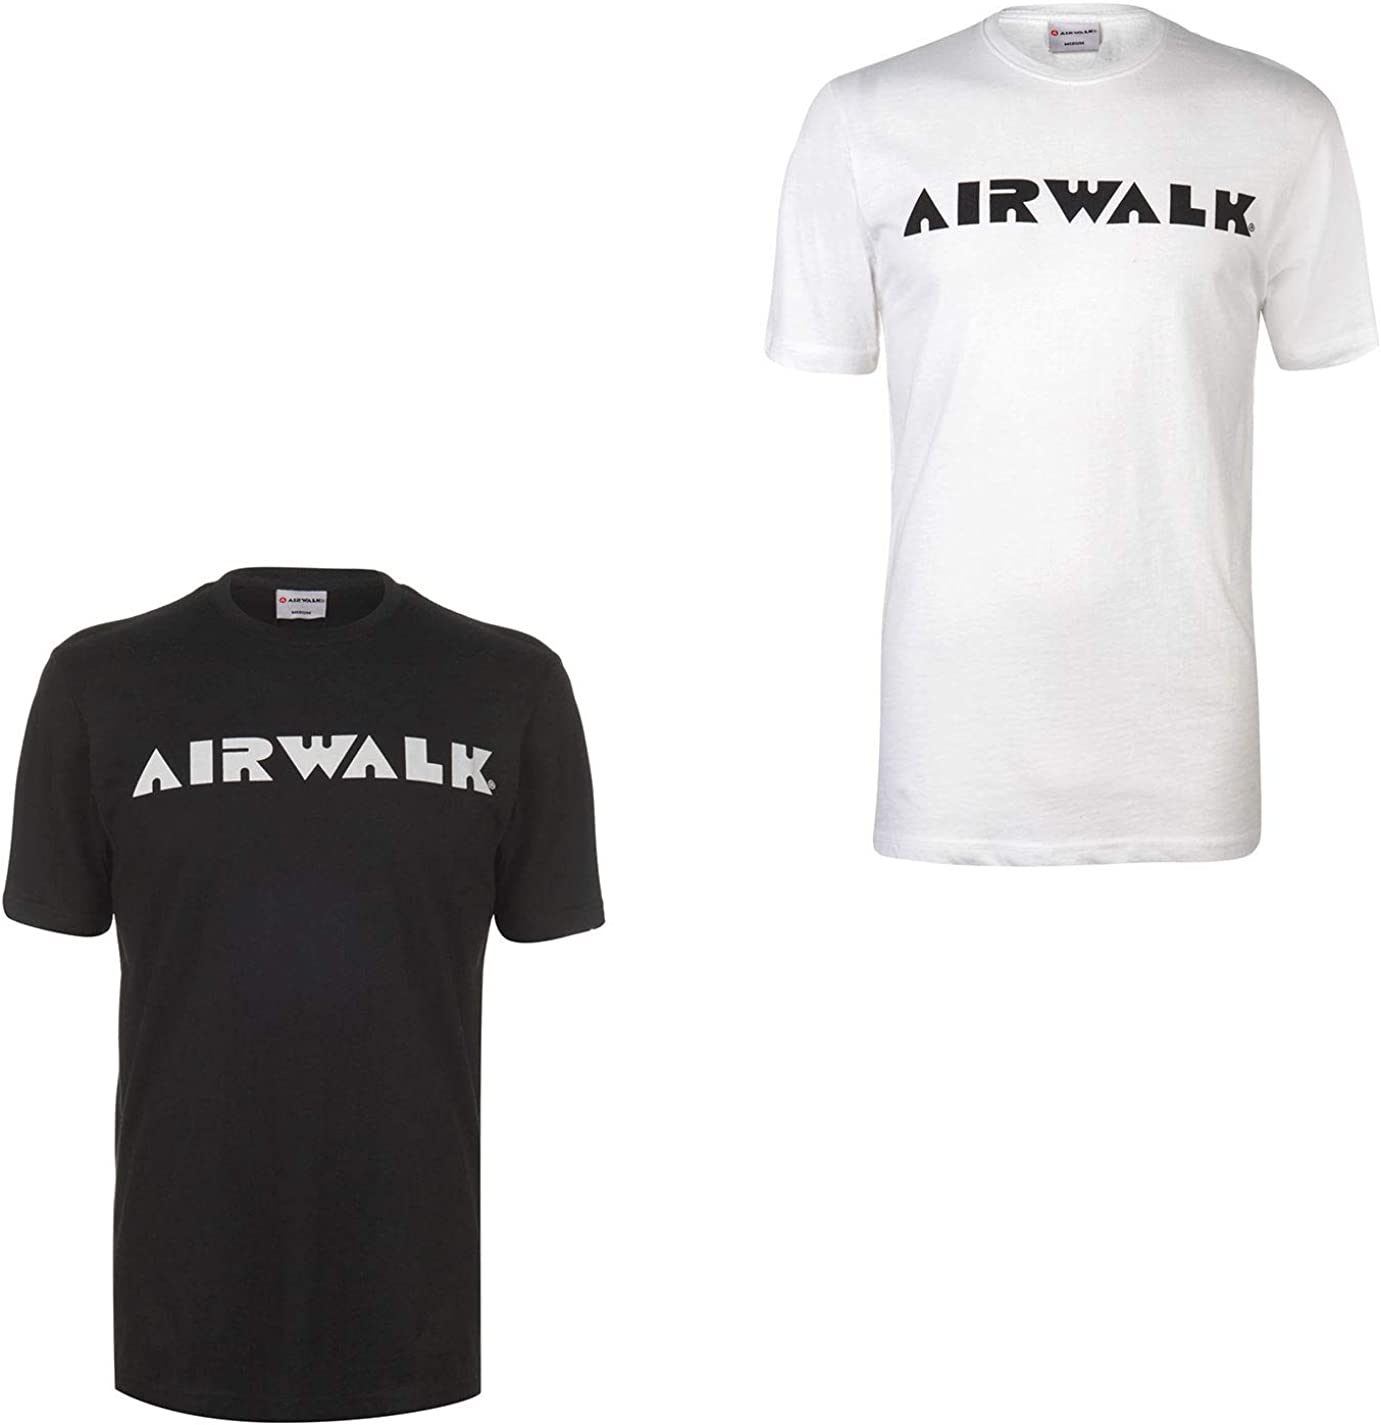 Airwalk Logo T-Shirt Mens Activewear Skateboarding Top Tee Shirt White Small